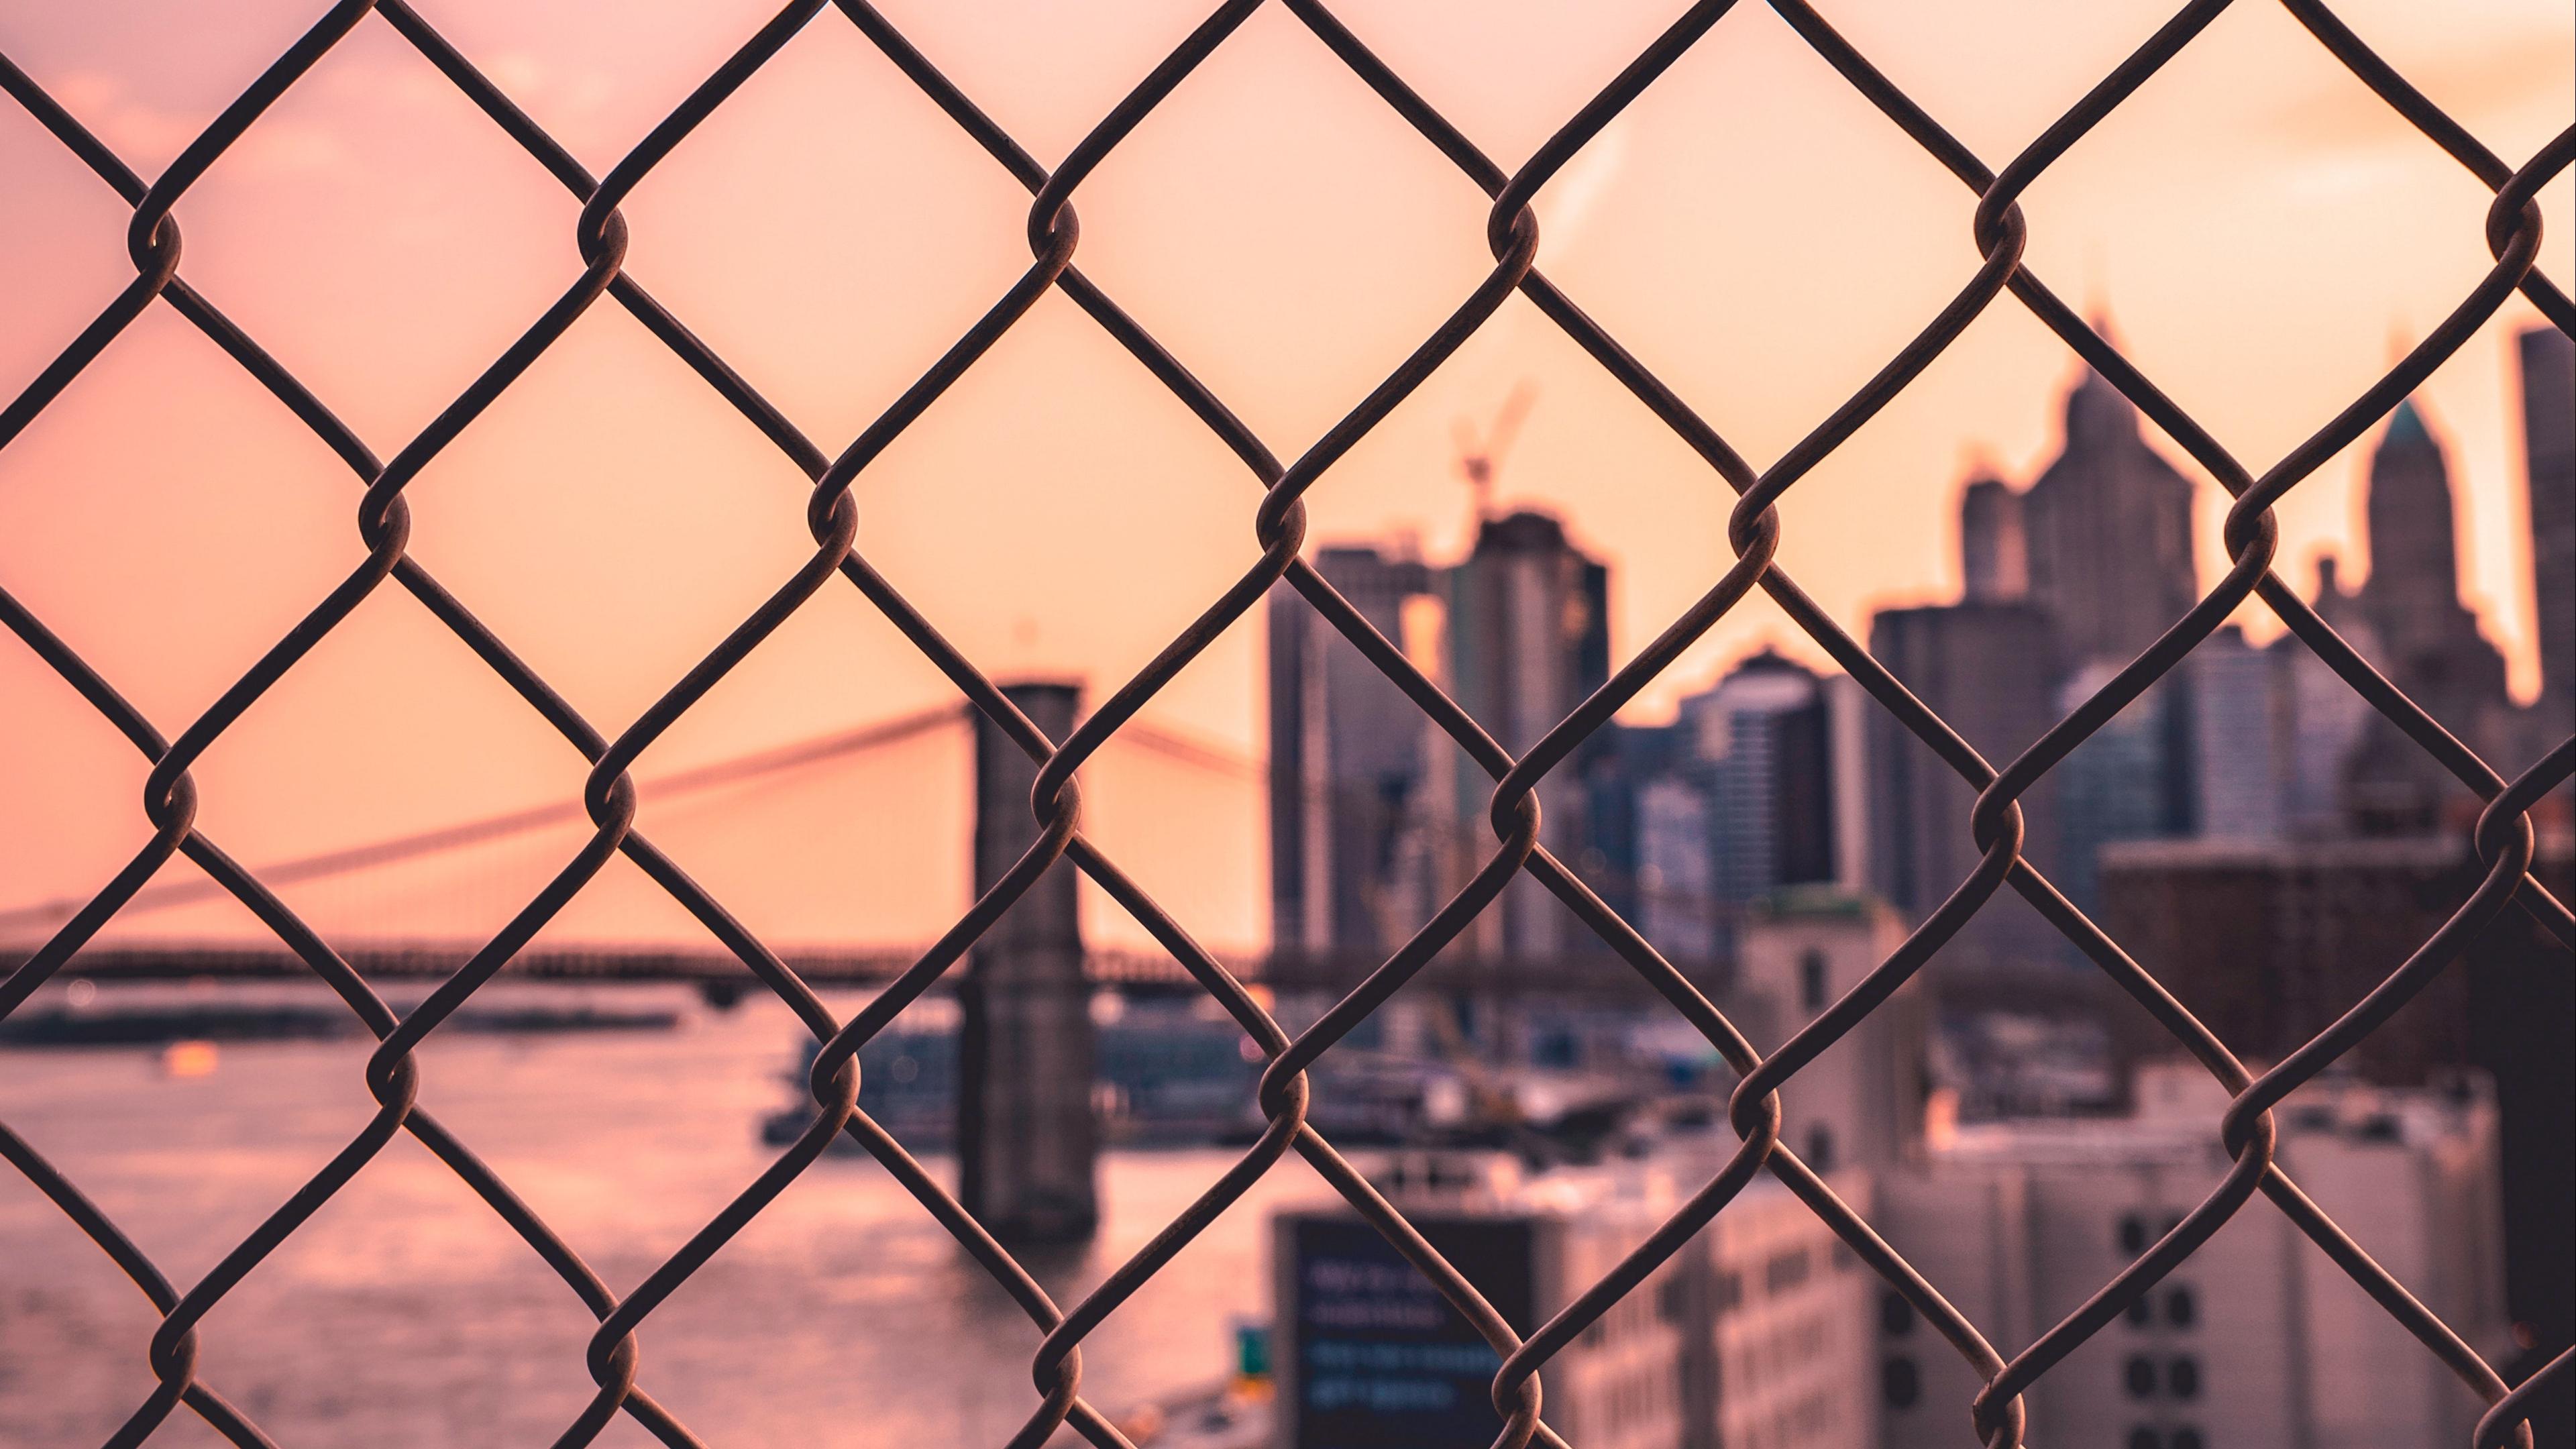 fence mesh city blur 4k 1538067067 - fence, mesh, city, blur 4k - mesh, fence, City